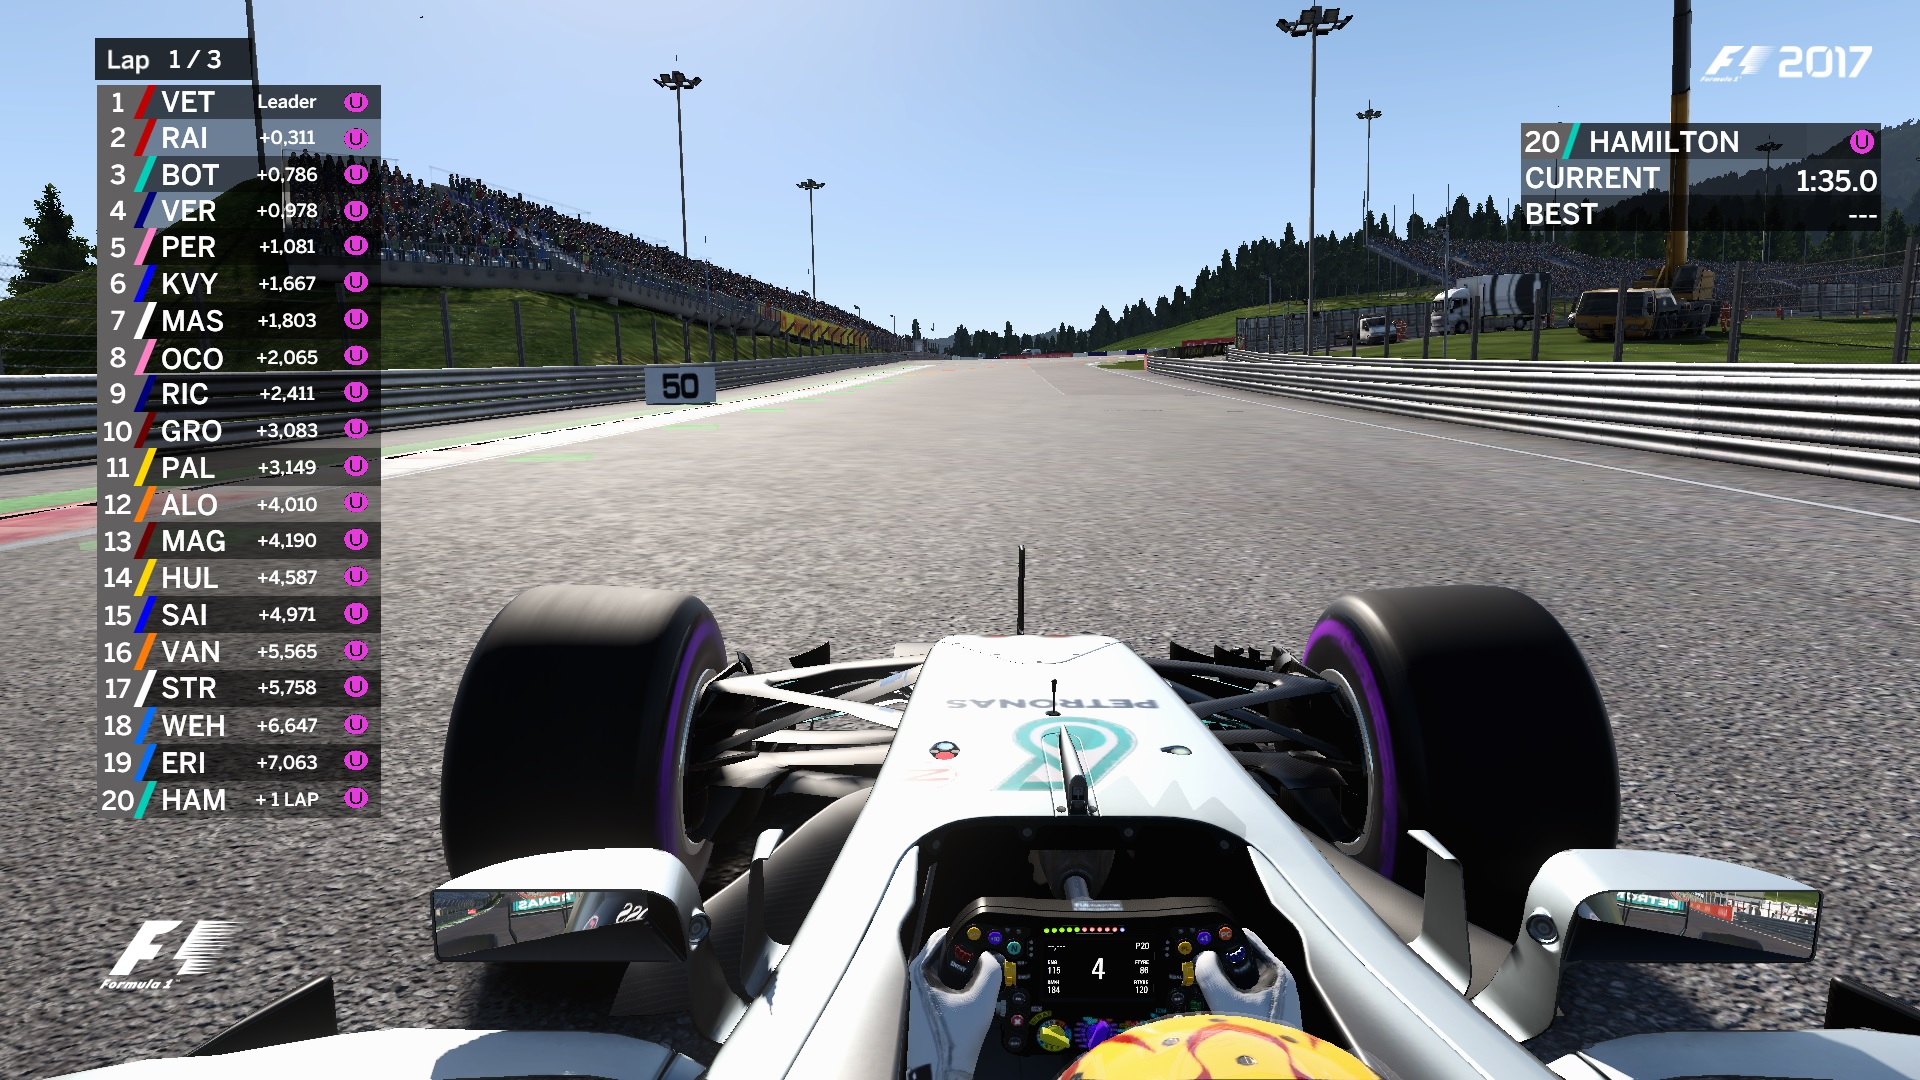 argHUD | RaceDepartment - Latest Formula 1, Motorsport, and